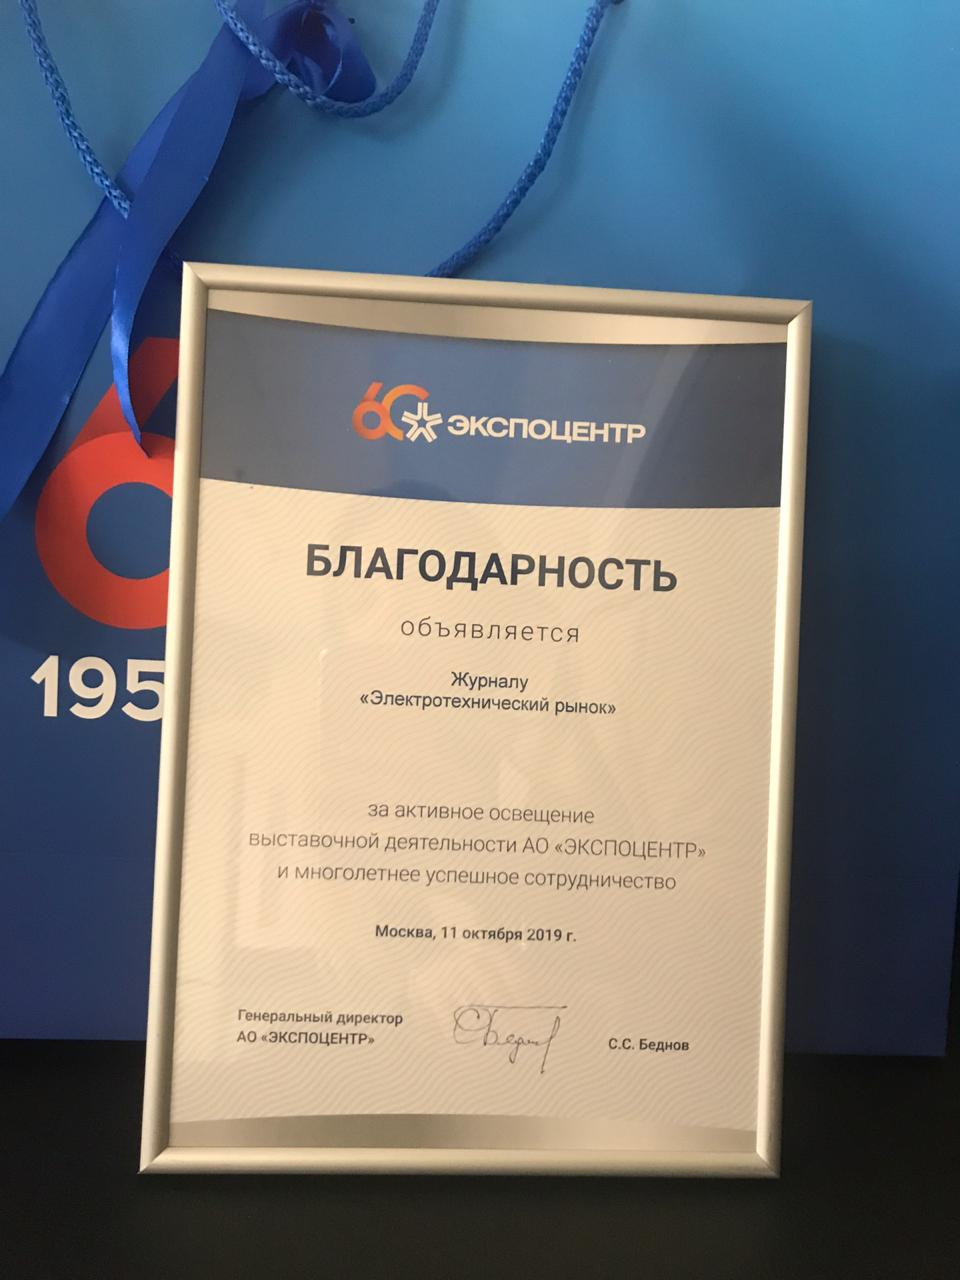 Компания Elec.ru получила заслуженную награду от «Экспоцентра»